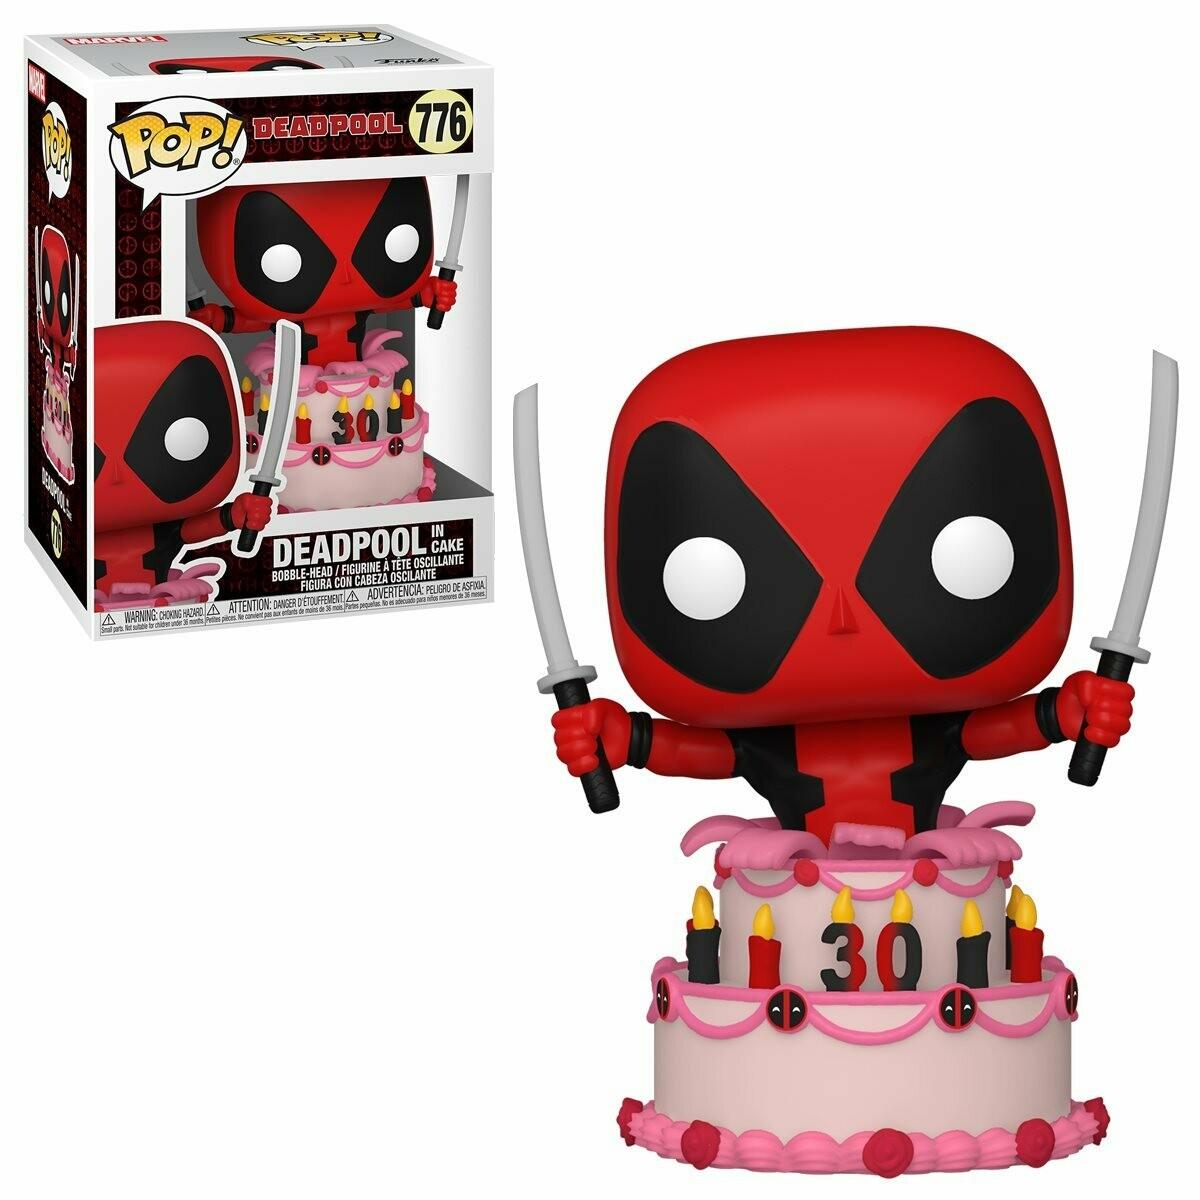 Funko Deadpool 30th Anniversary Deadpool in Cake Pop! Vinyl Figure